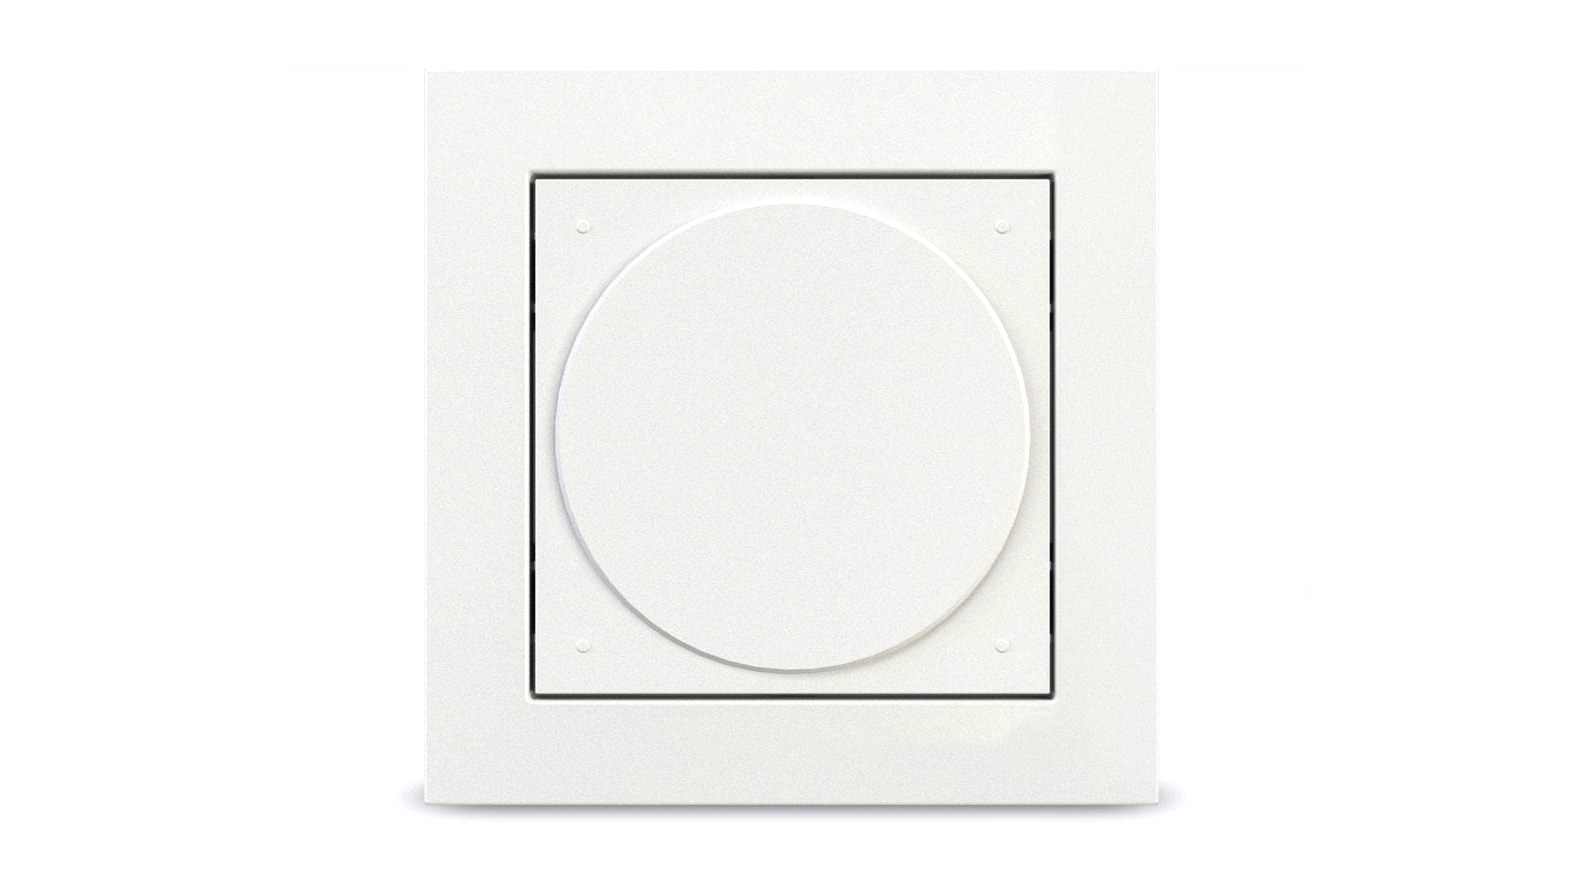 Parce L1 Smart Light Switch Homekit News And Reviews